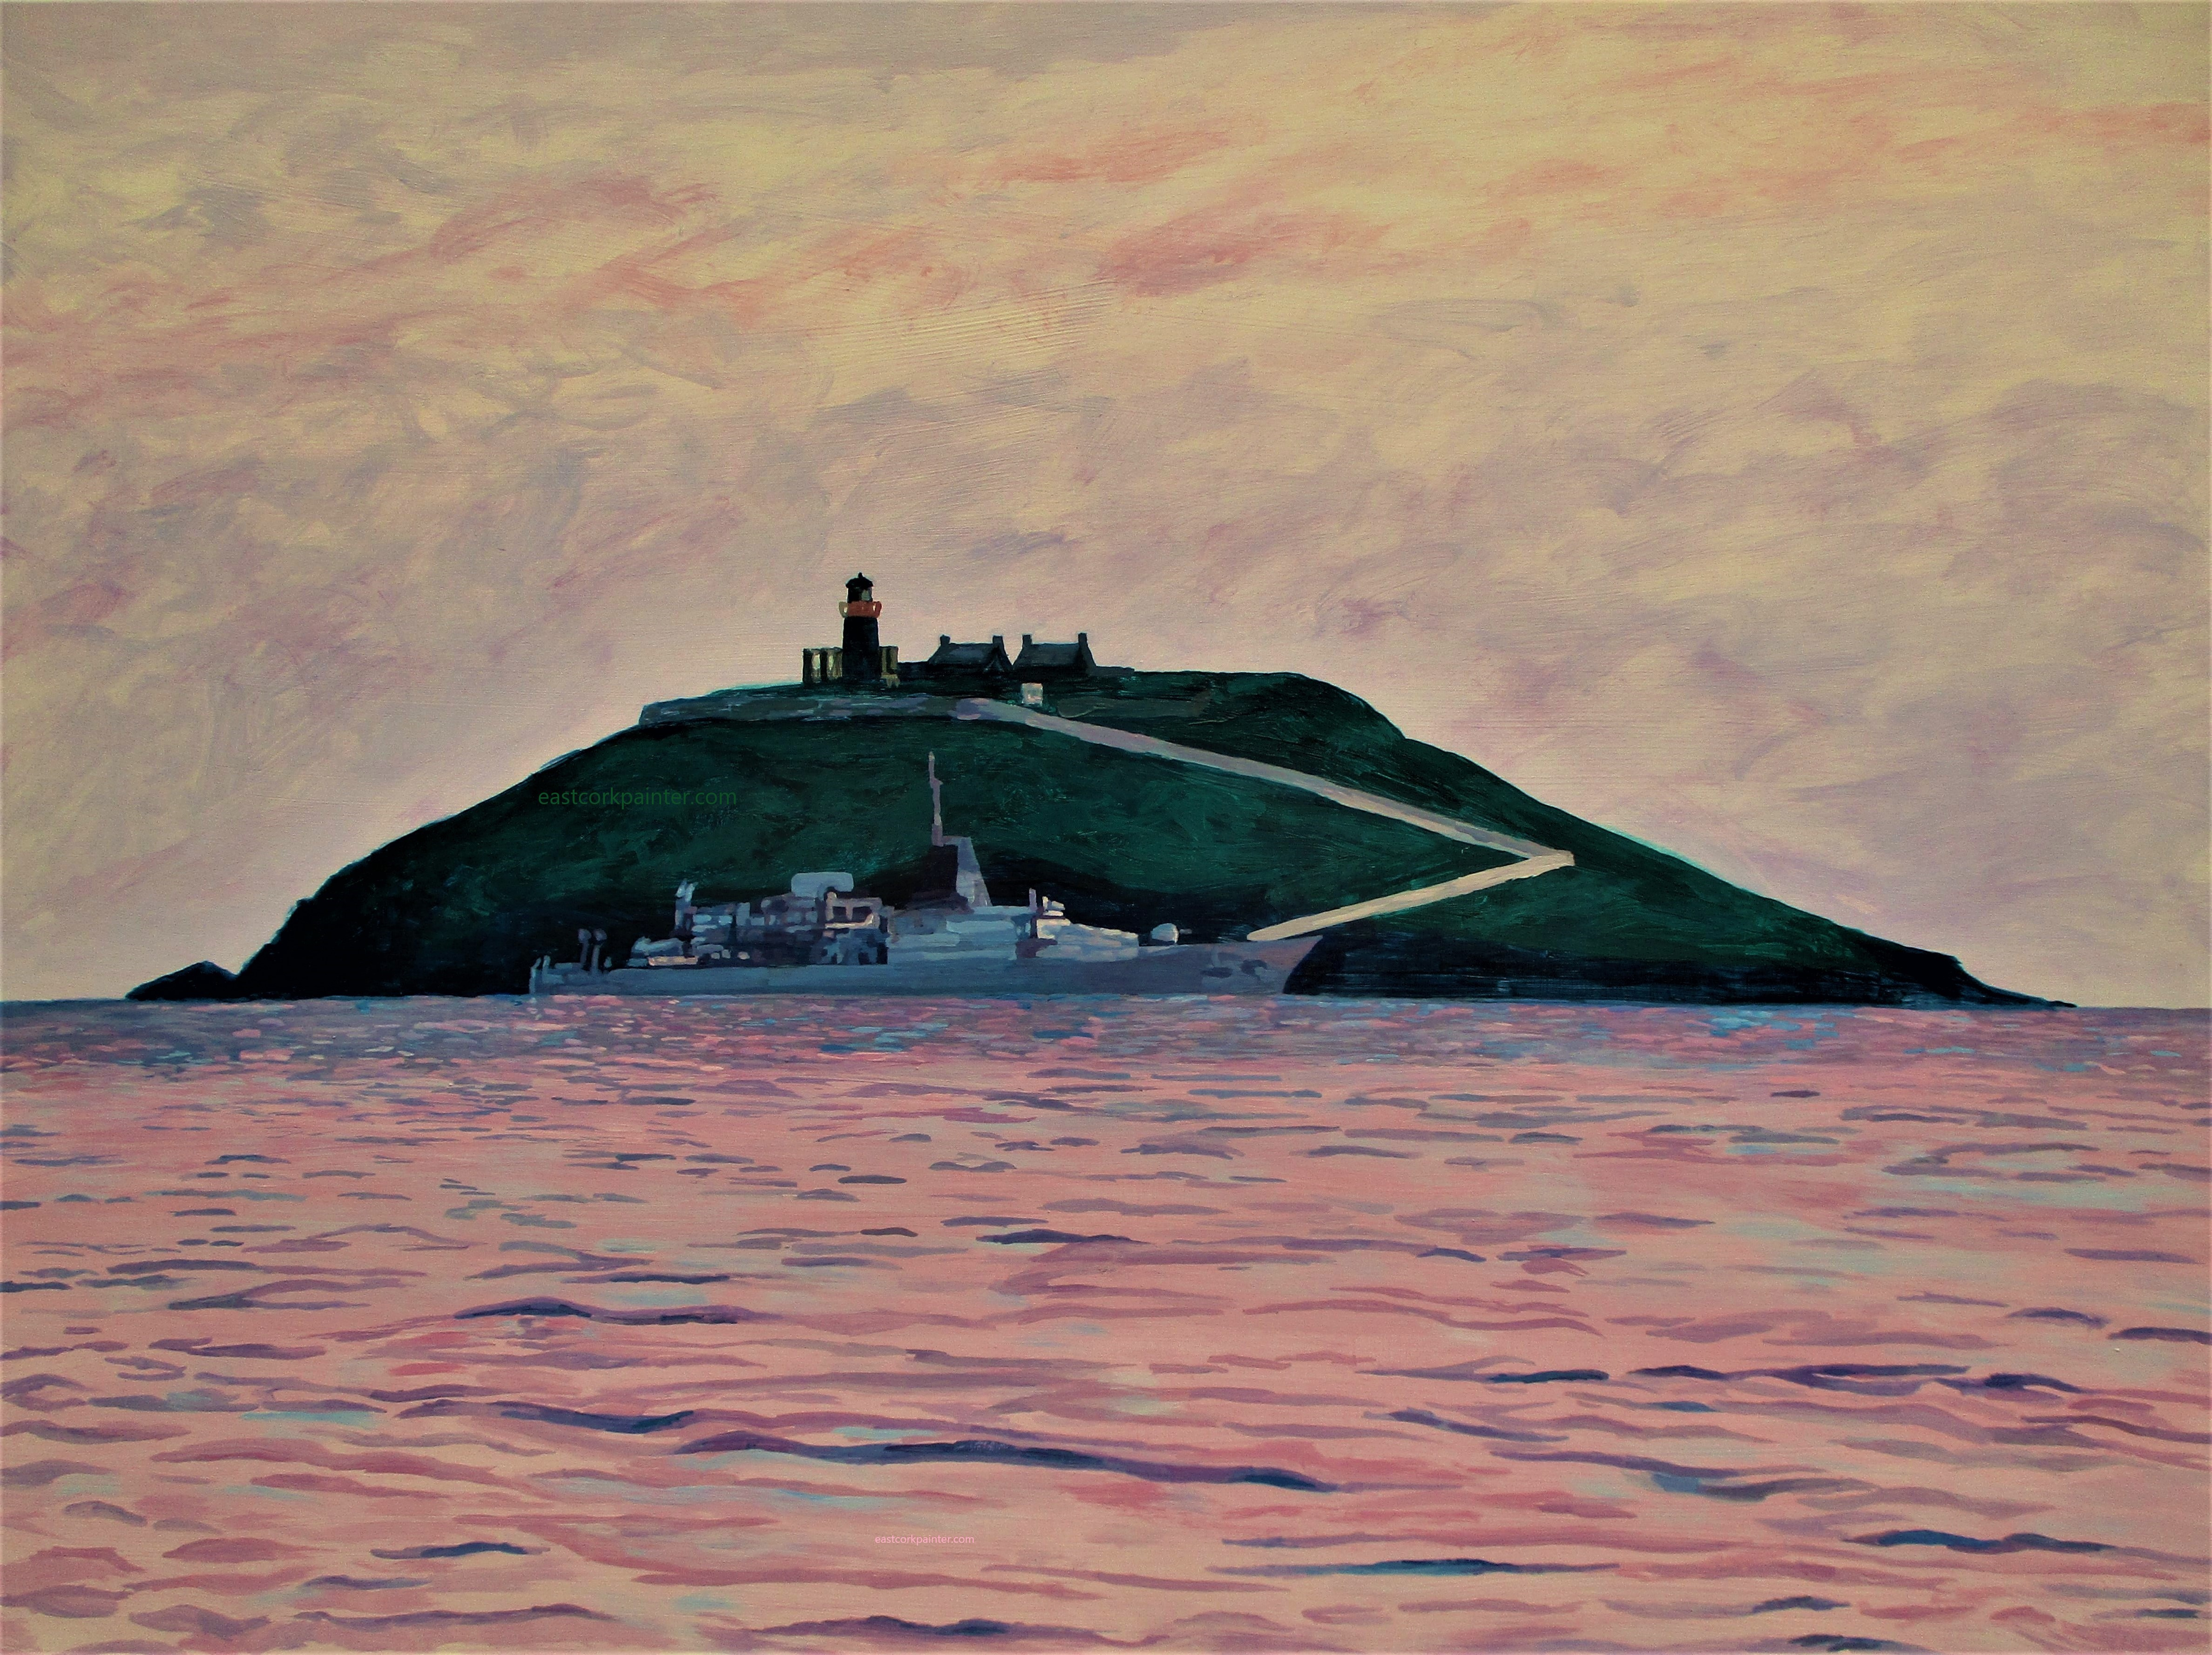 Irish Naval Ship In Front Of Ballycotton Island 2 watermark